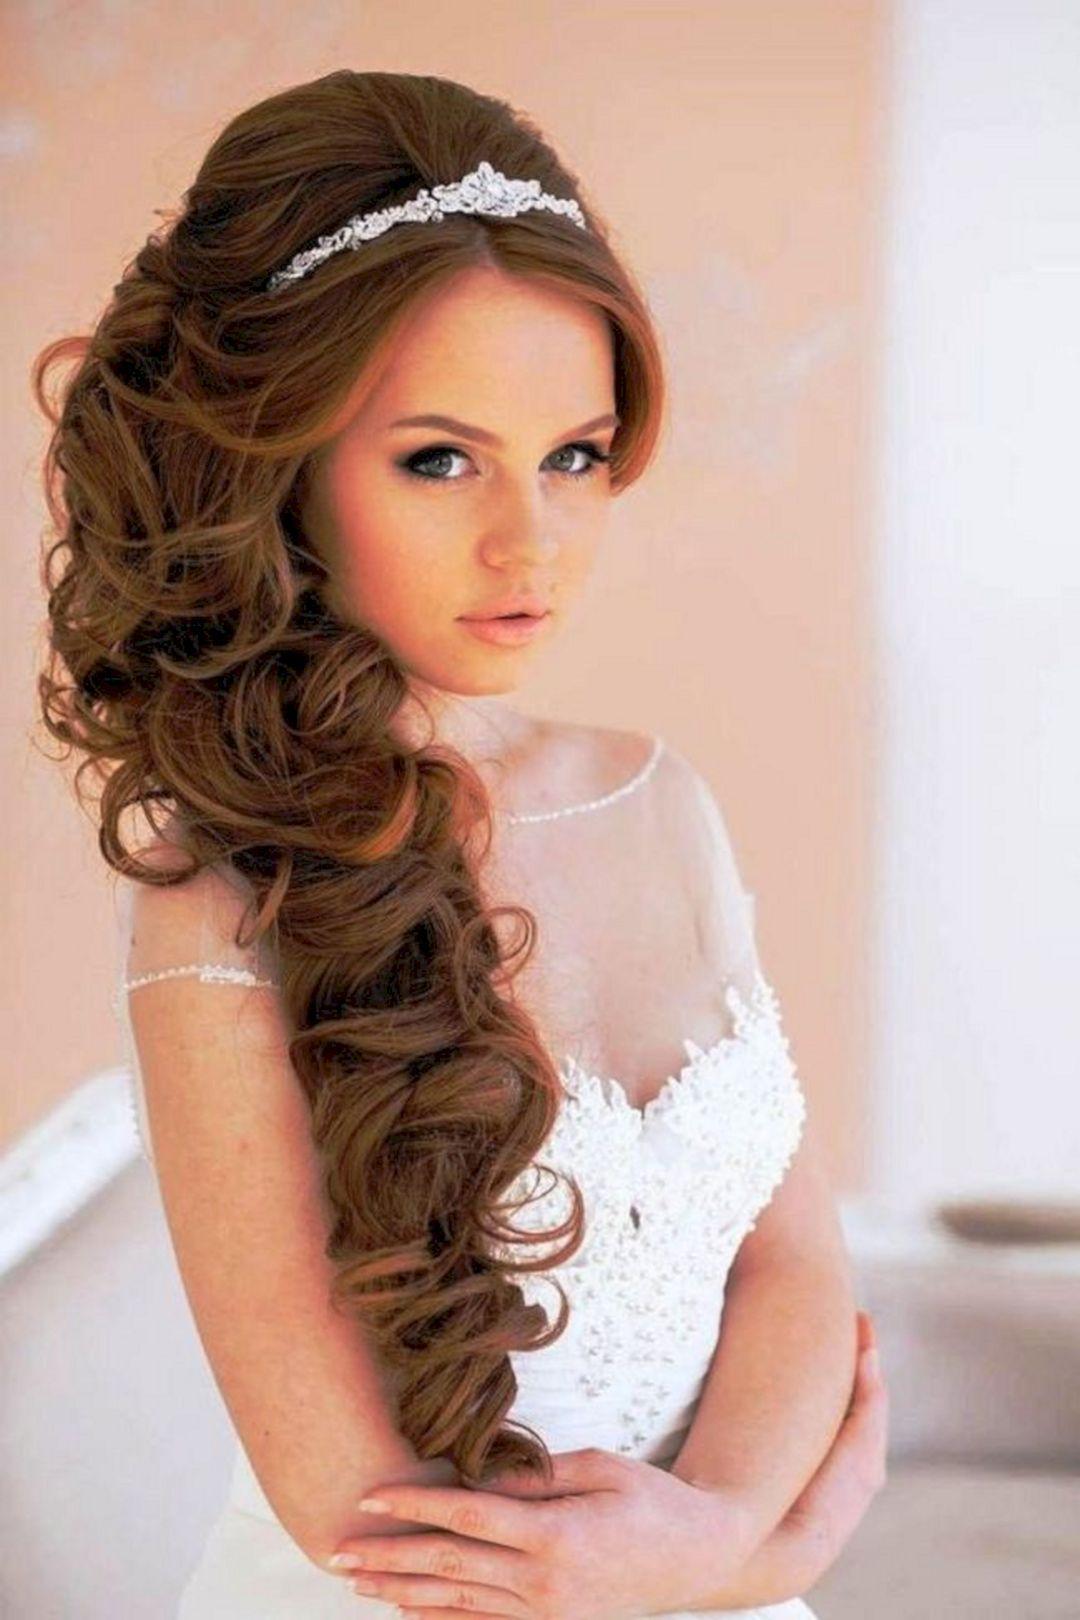 25 Beautiful Vintage Wedding Hairstyles Design With Veil Ideas Long Hair Wedding Styles Hairstyles With Tiara Wedding Hairstyles With Tiara